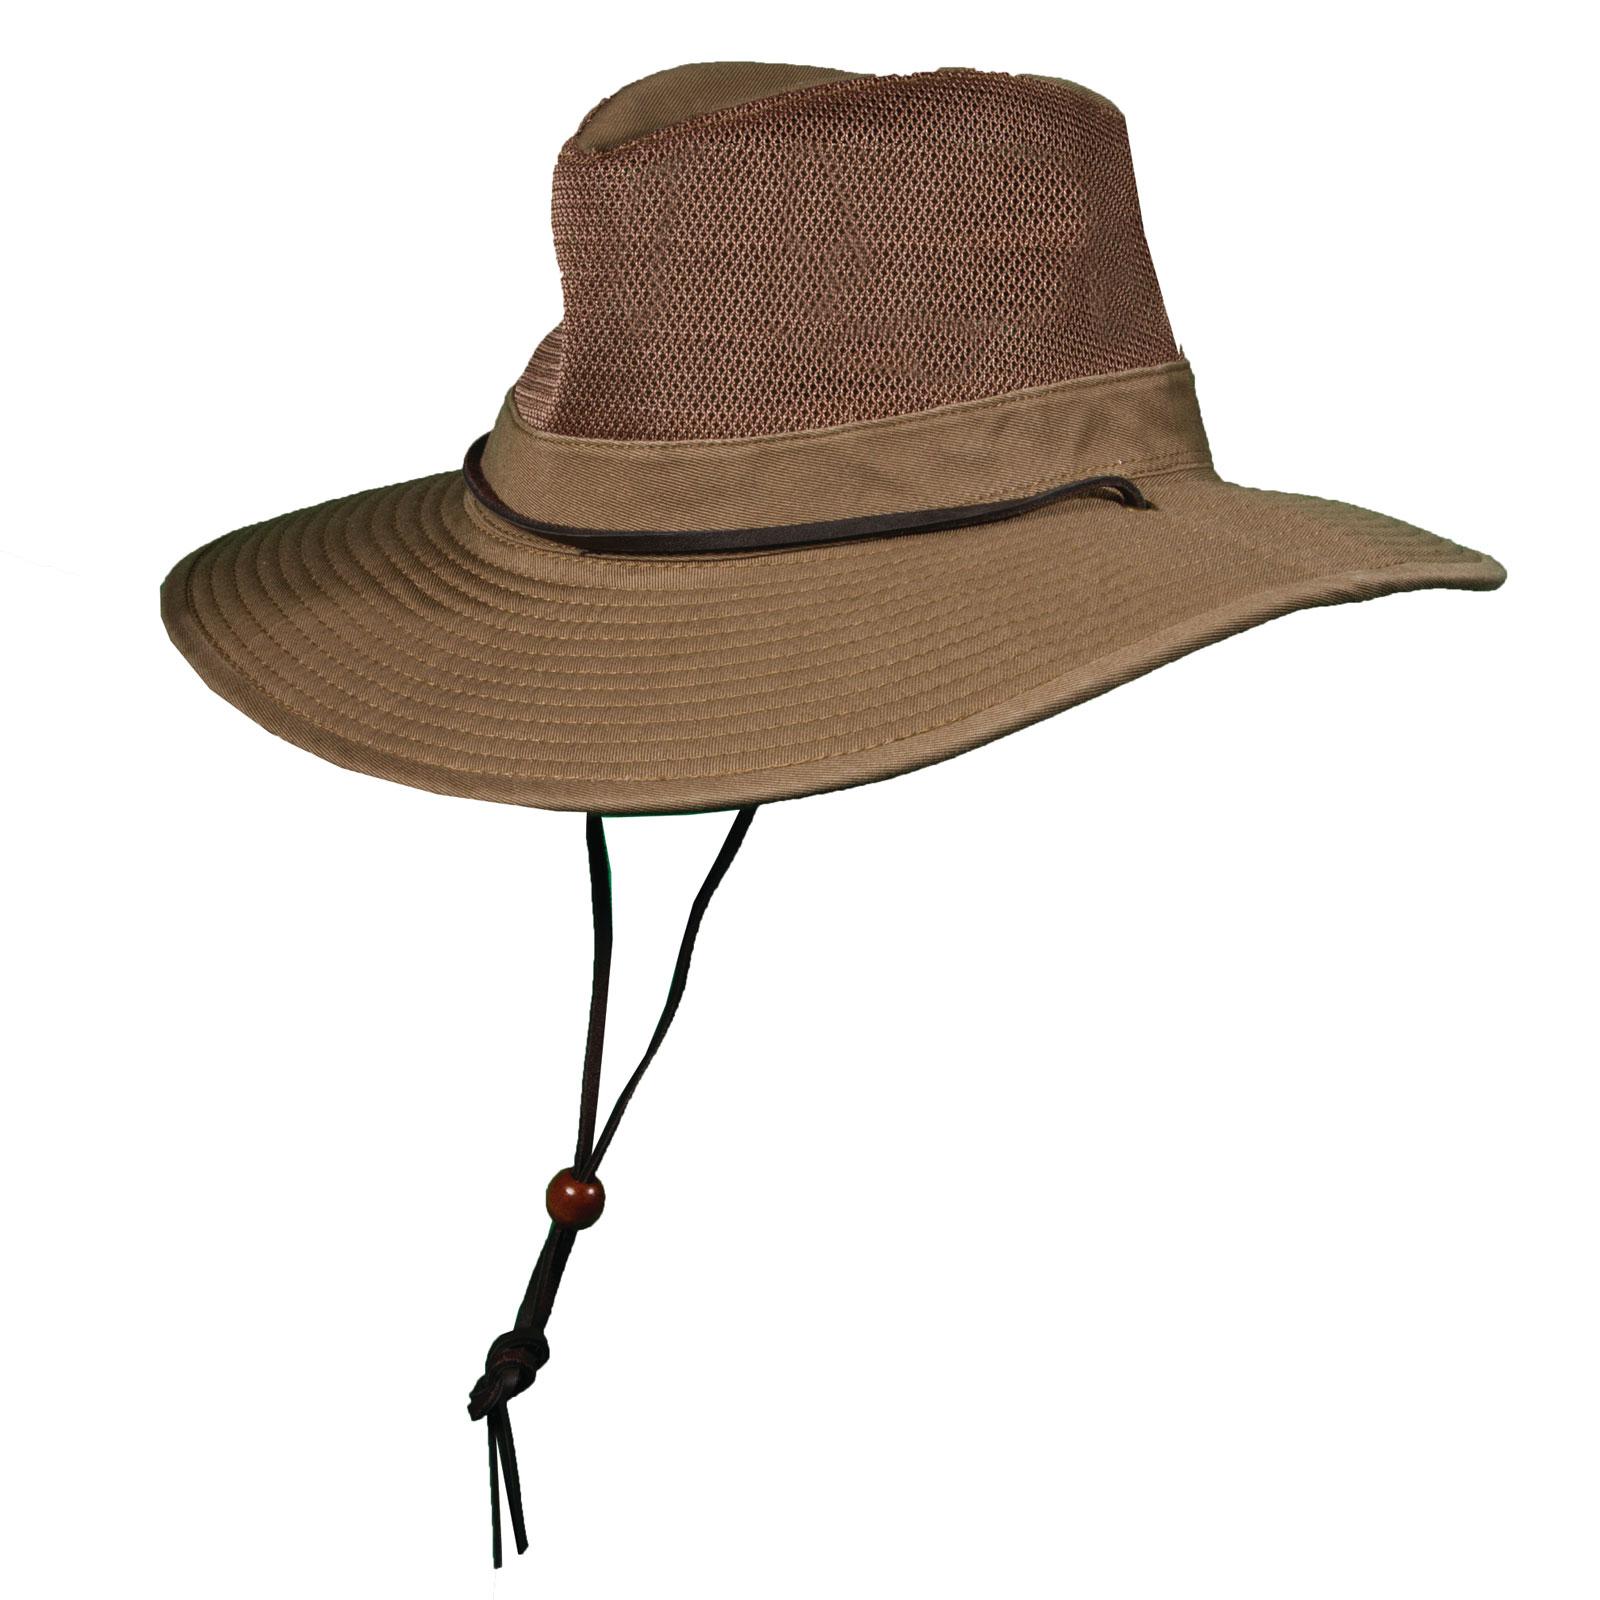 1c563e21583 Olive Garment Washed Twill Safari Hat with Mesh Sidewall · 864WM BRONZE 3Q